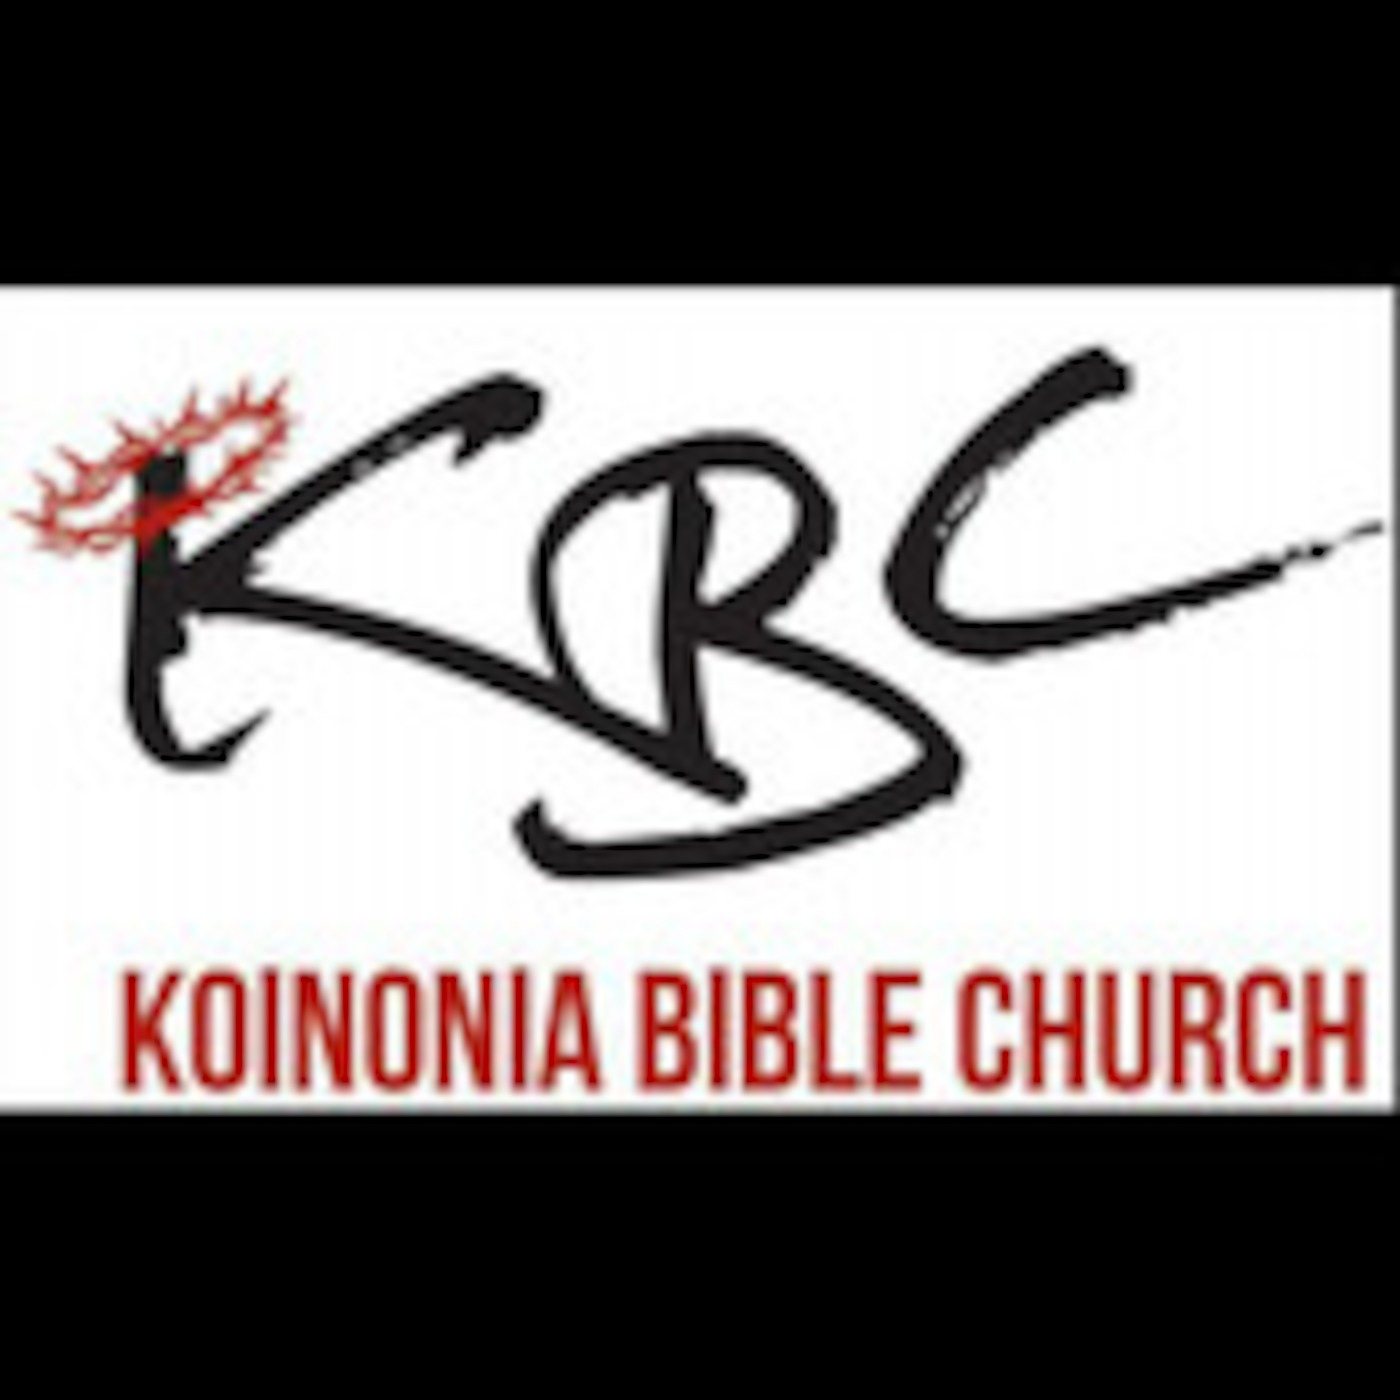 Koinonia Bible Church Sermons